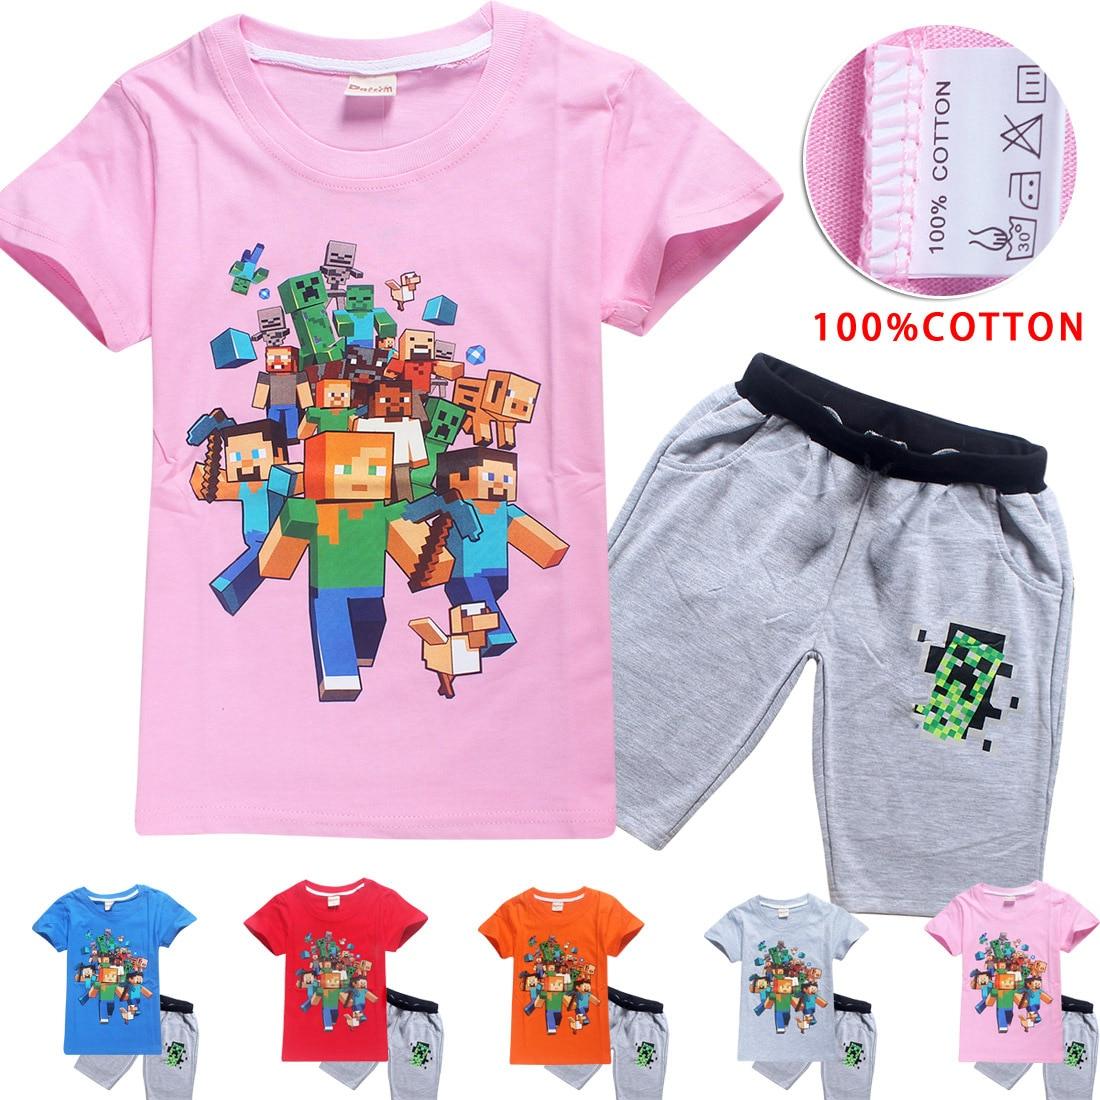 Minecraft Kids Set 100% Cotton Boys Girls Adventure Video Game Short Sleeve Shirts Our World Cartoon Tops Pants Baby Clothes Set cotton cartoon t shirts